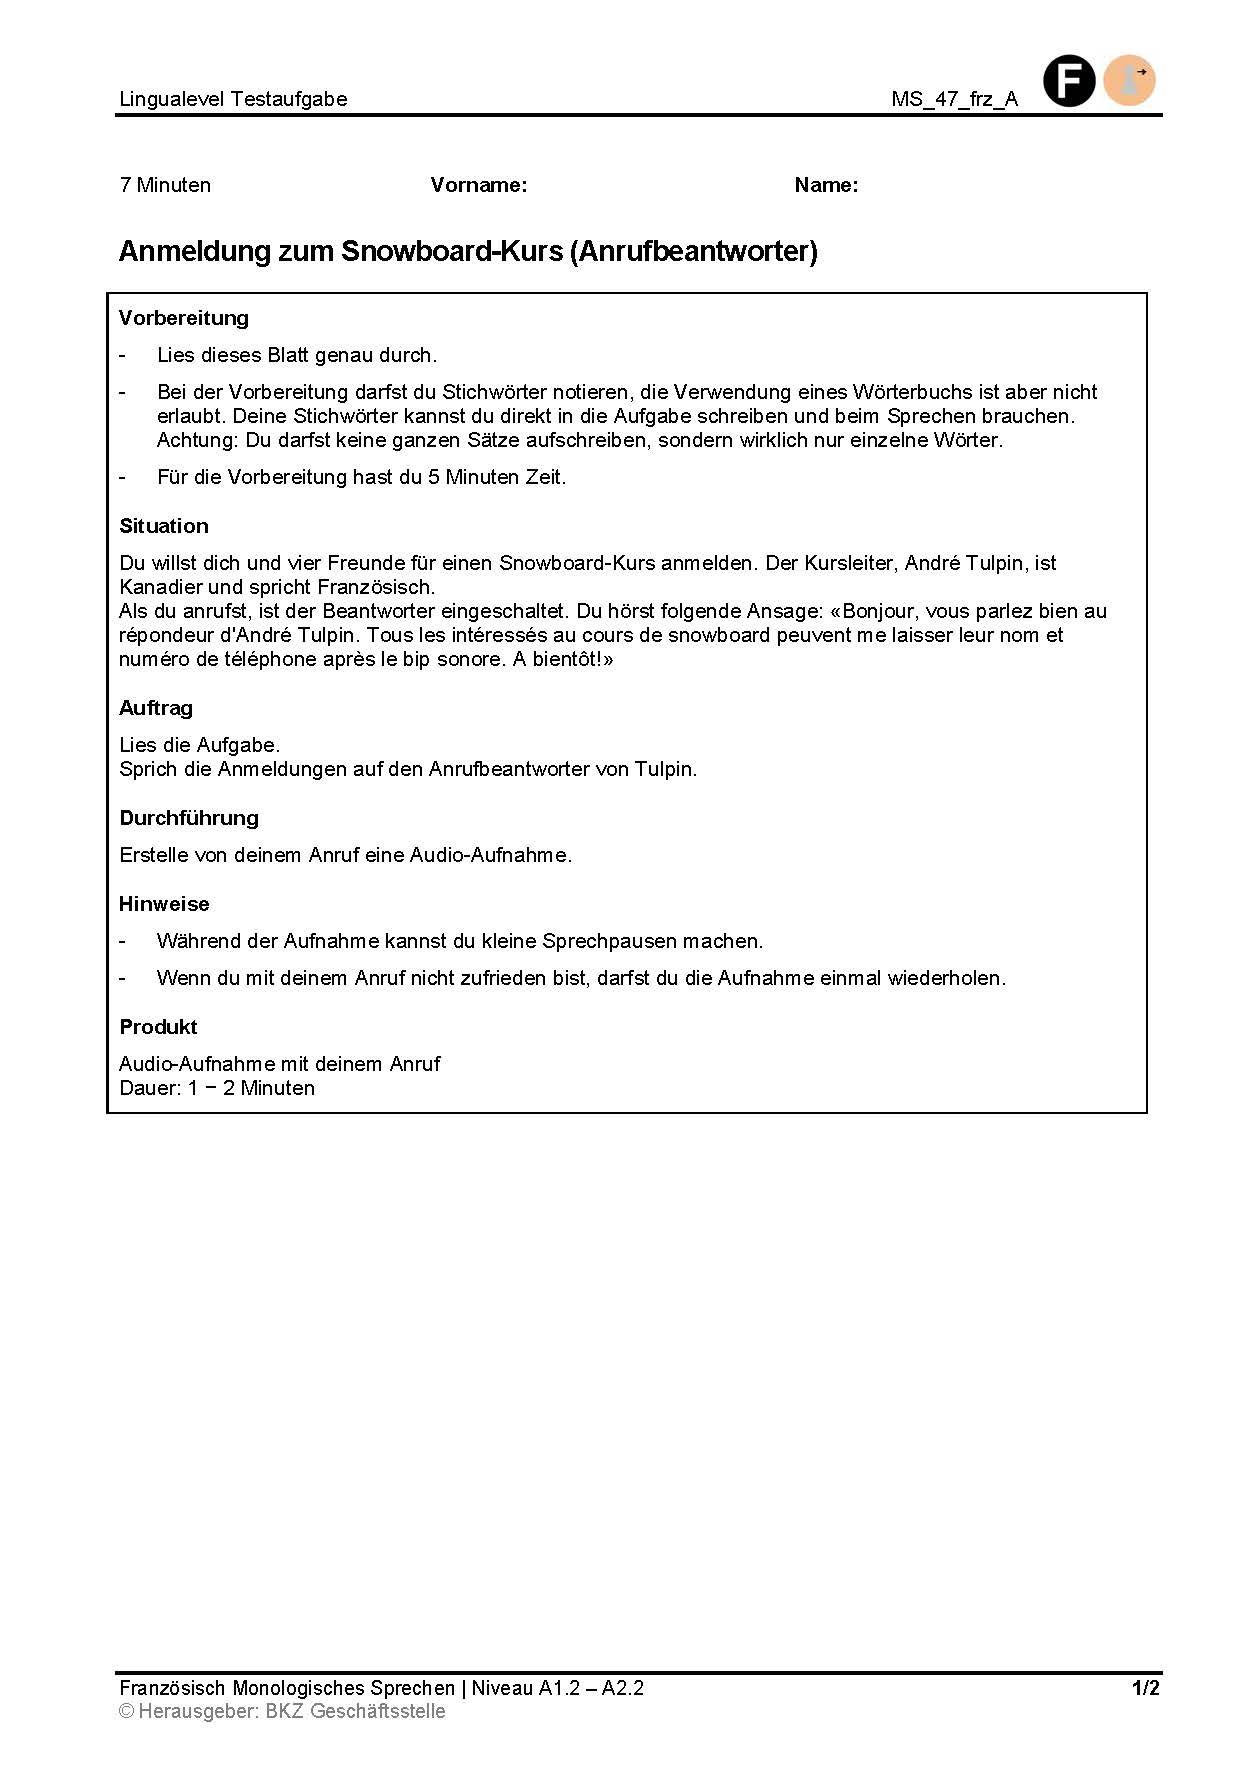 Preview image for LOM object Anmeldung zum Snowboard-Kurs (Anrufbeantworter)